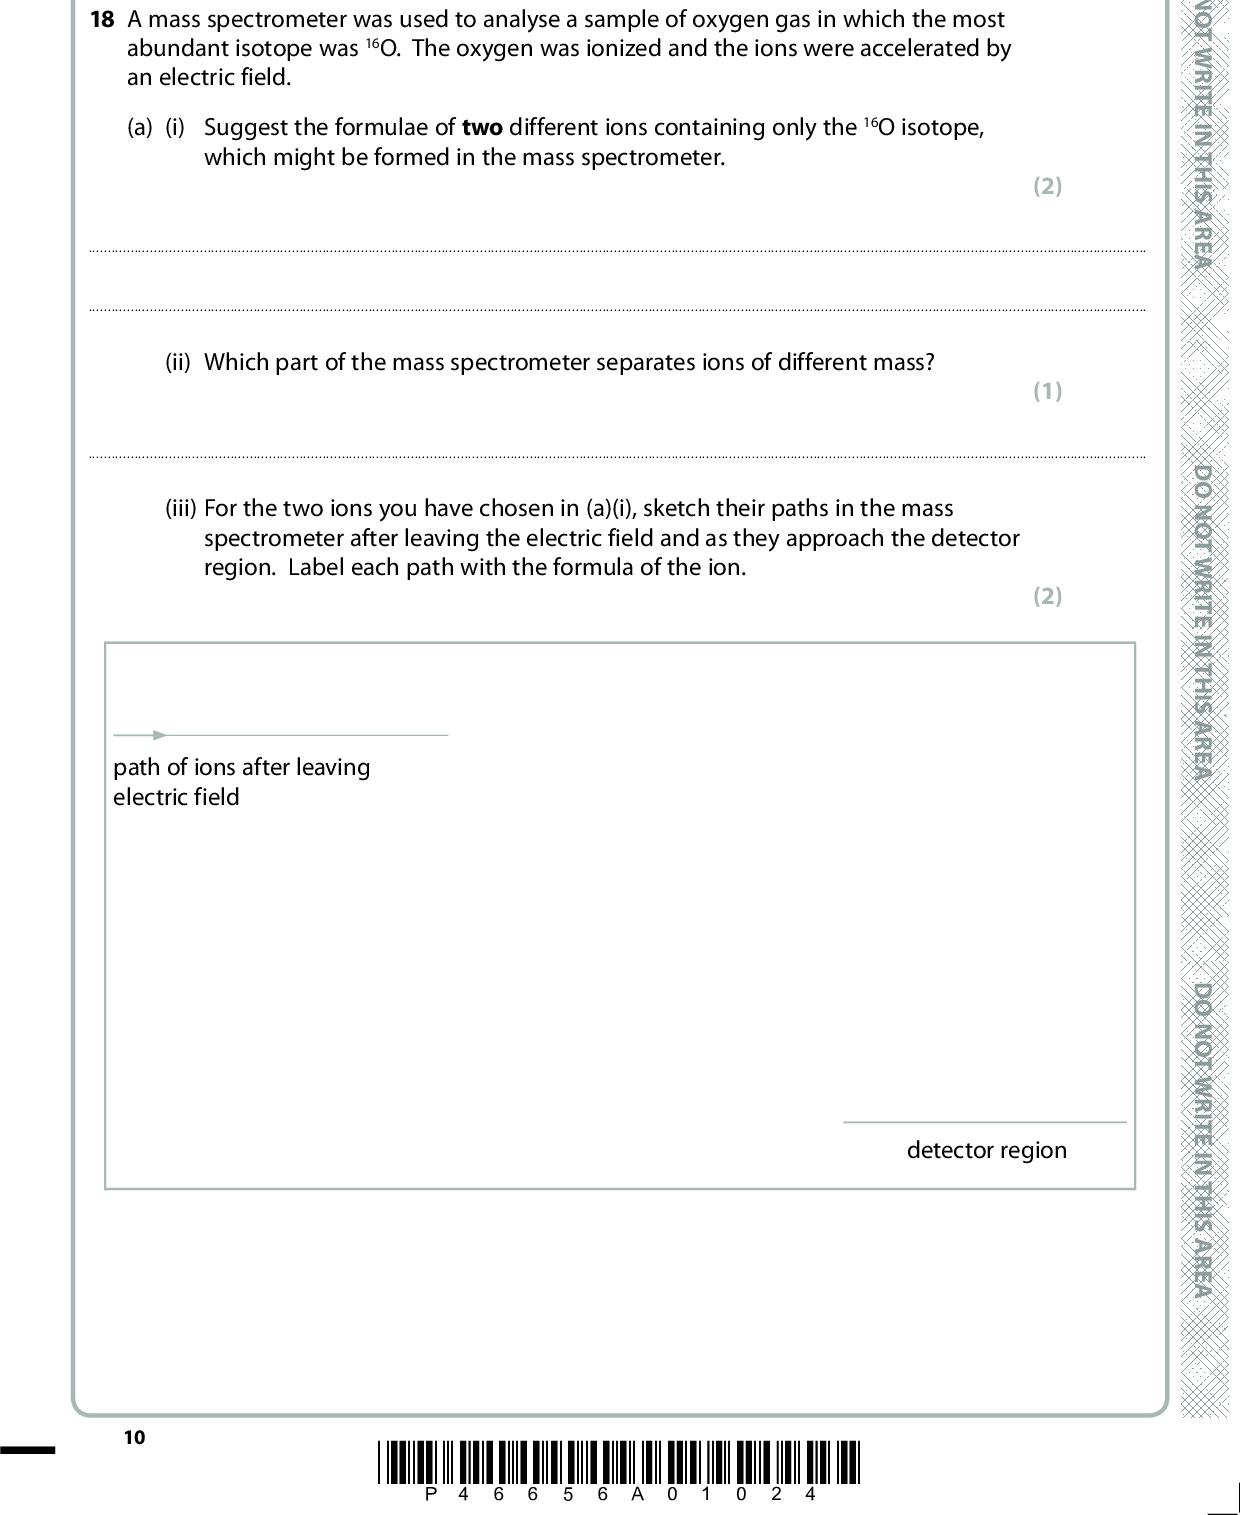 Edexcel Jun 2016 Paper 1 Q18 (with explained solutions)  